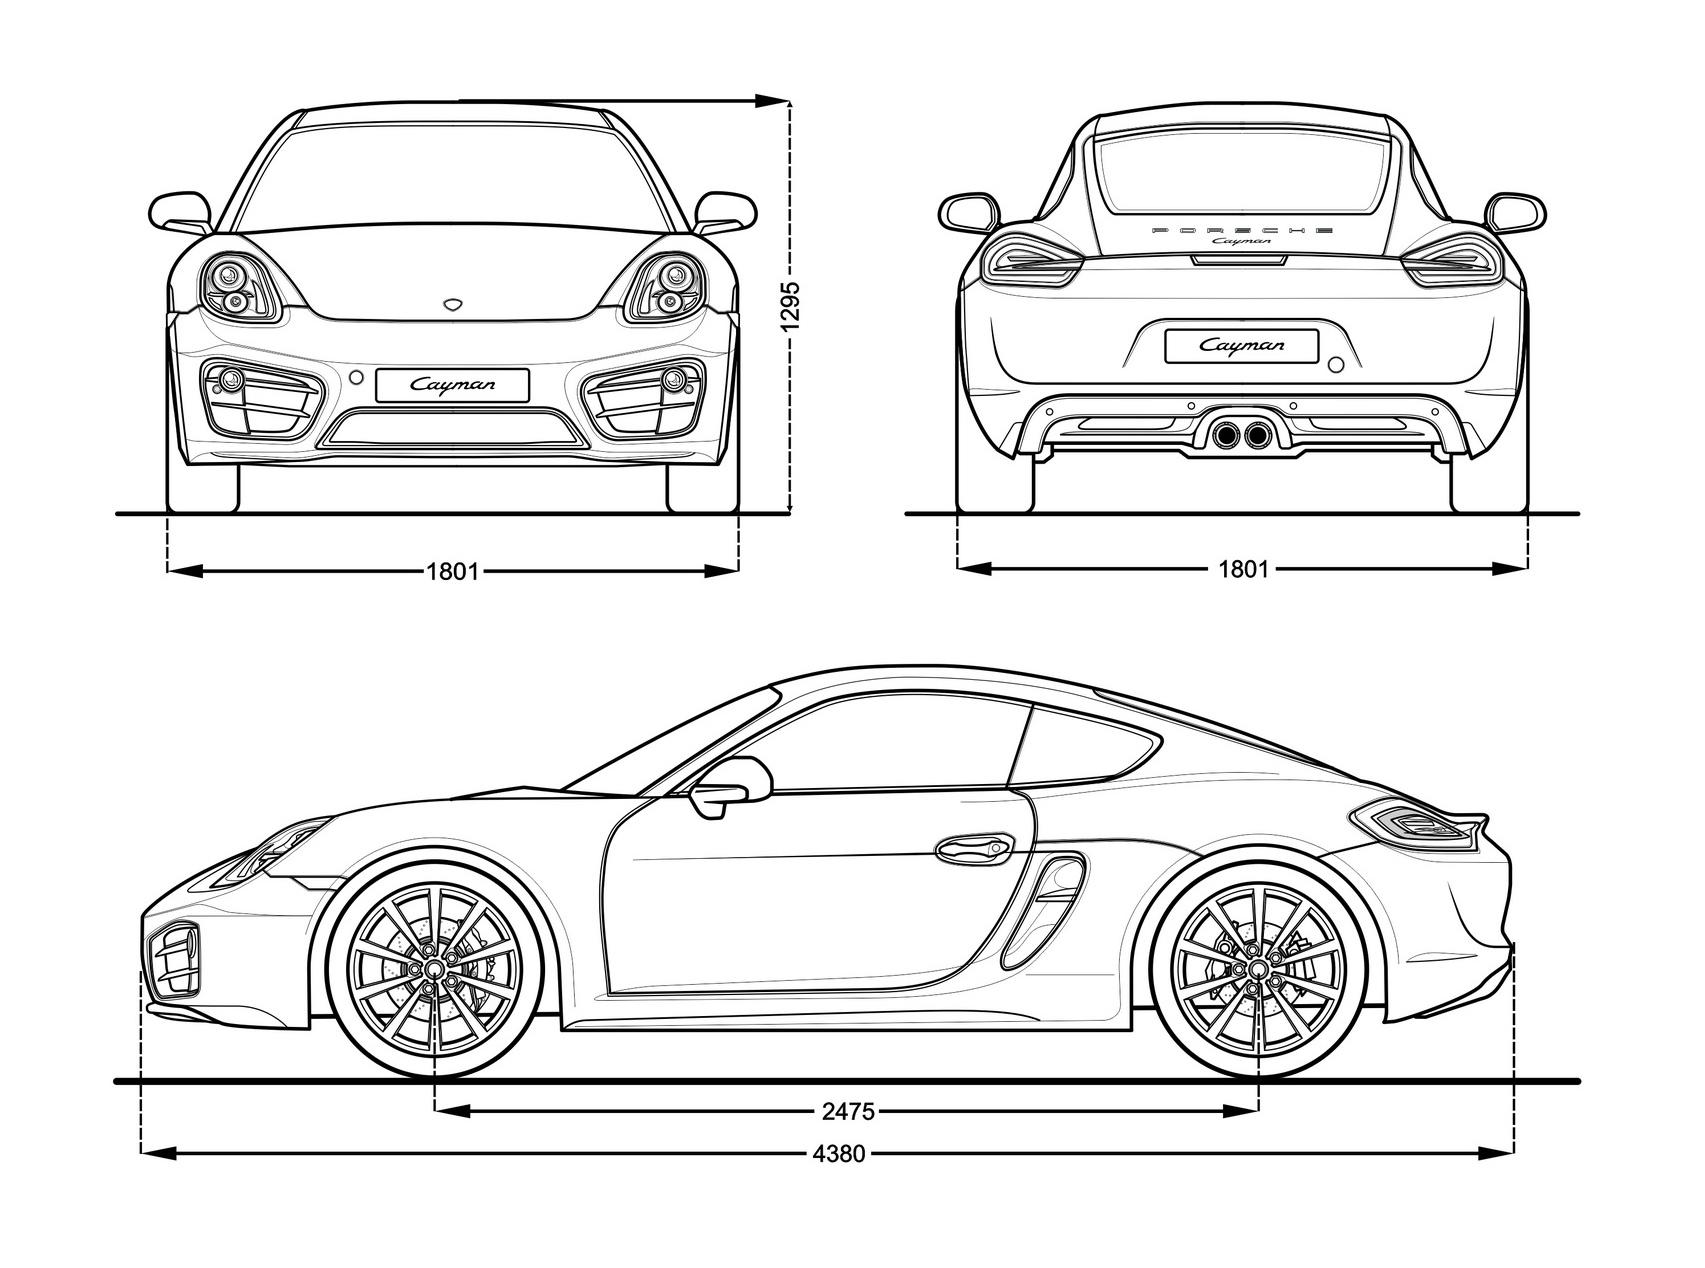 Porsche cayman s 2014 blueprint download free blueprint for 3d porsche cayman s blueprint malvernweather Gallery